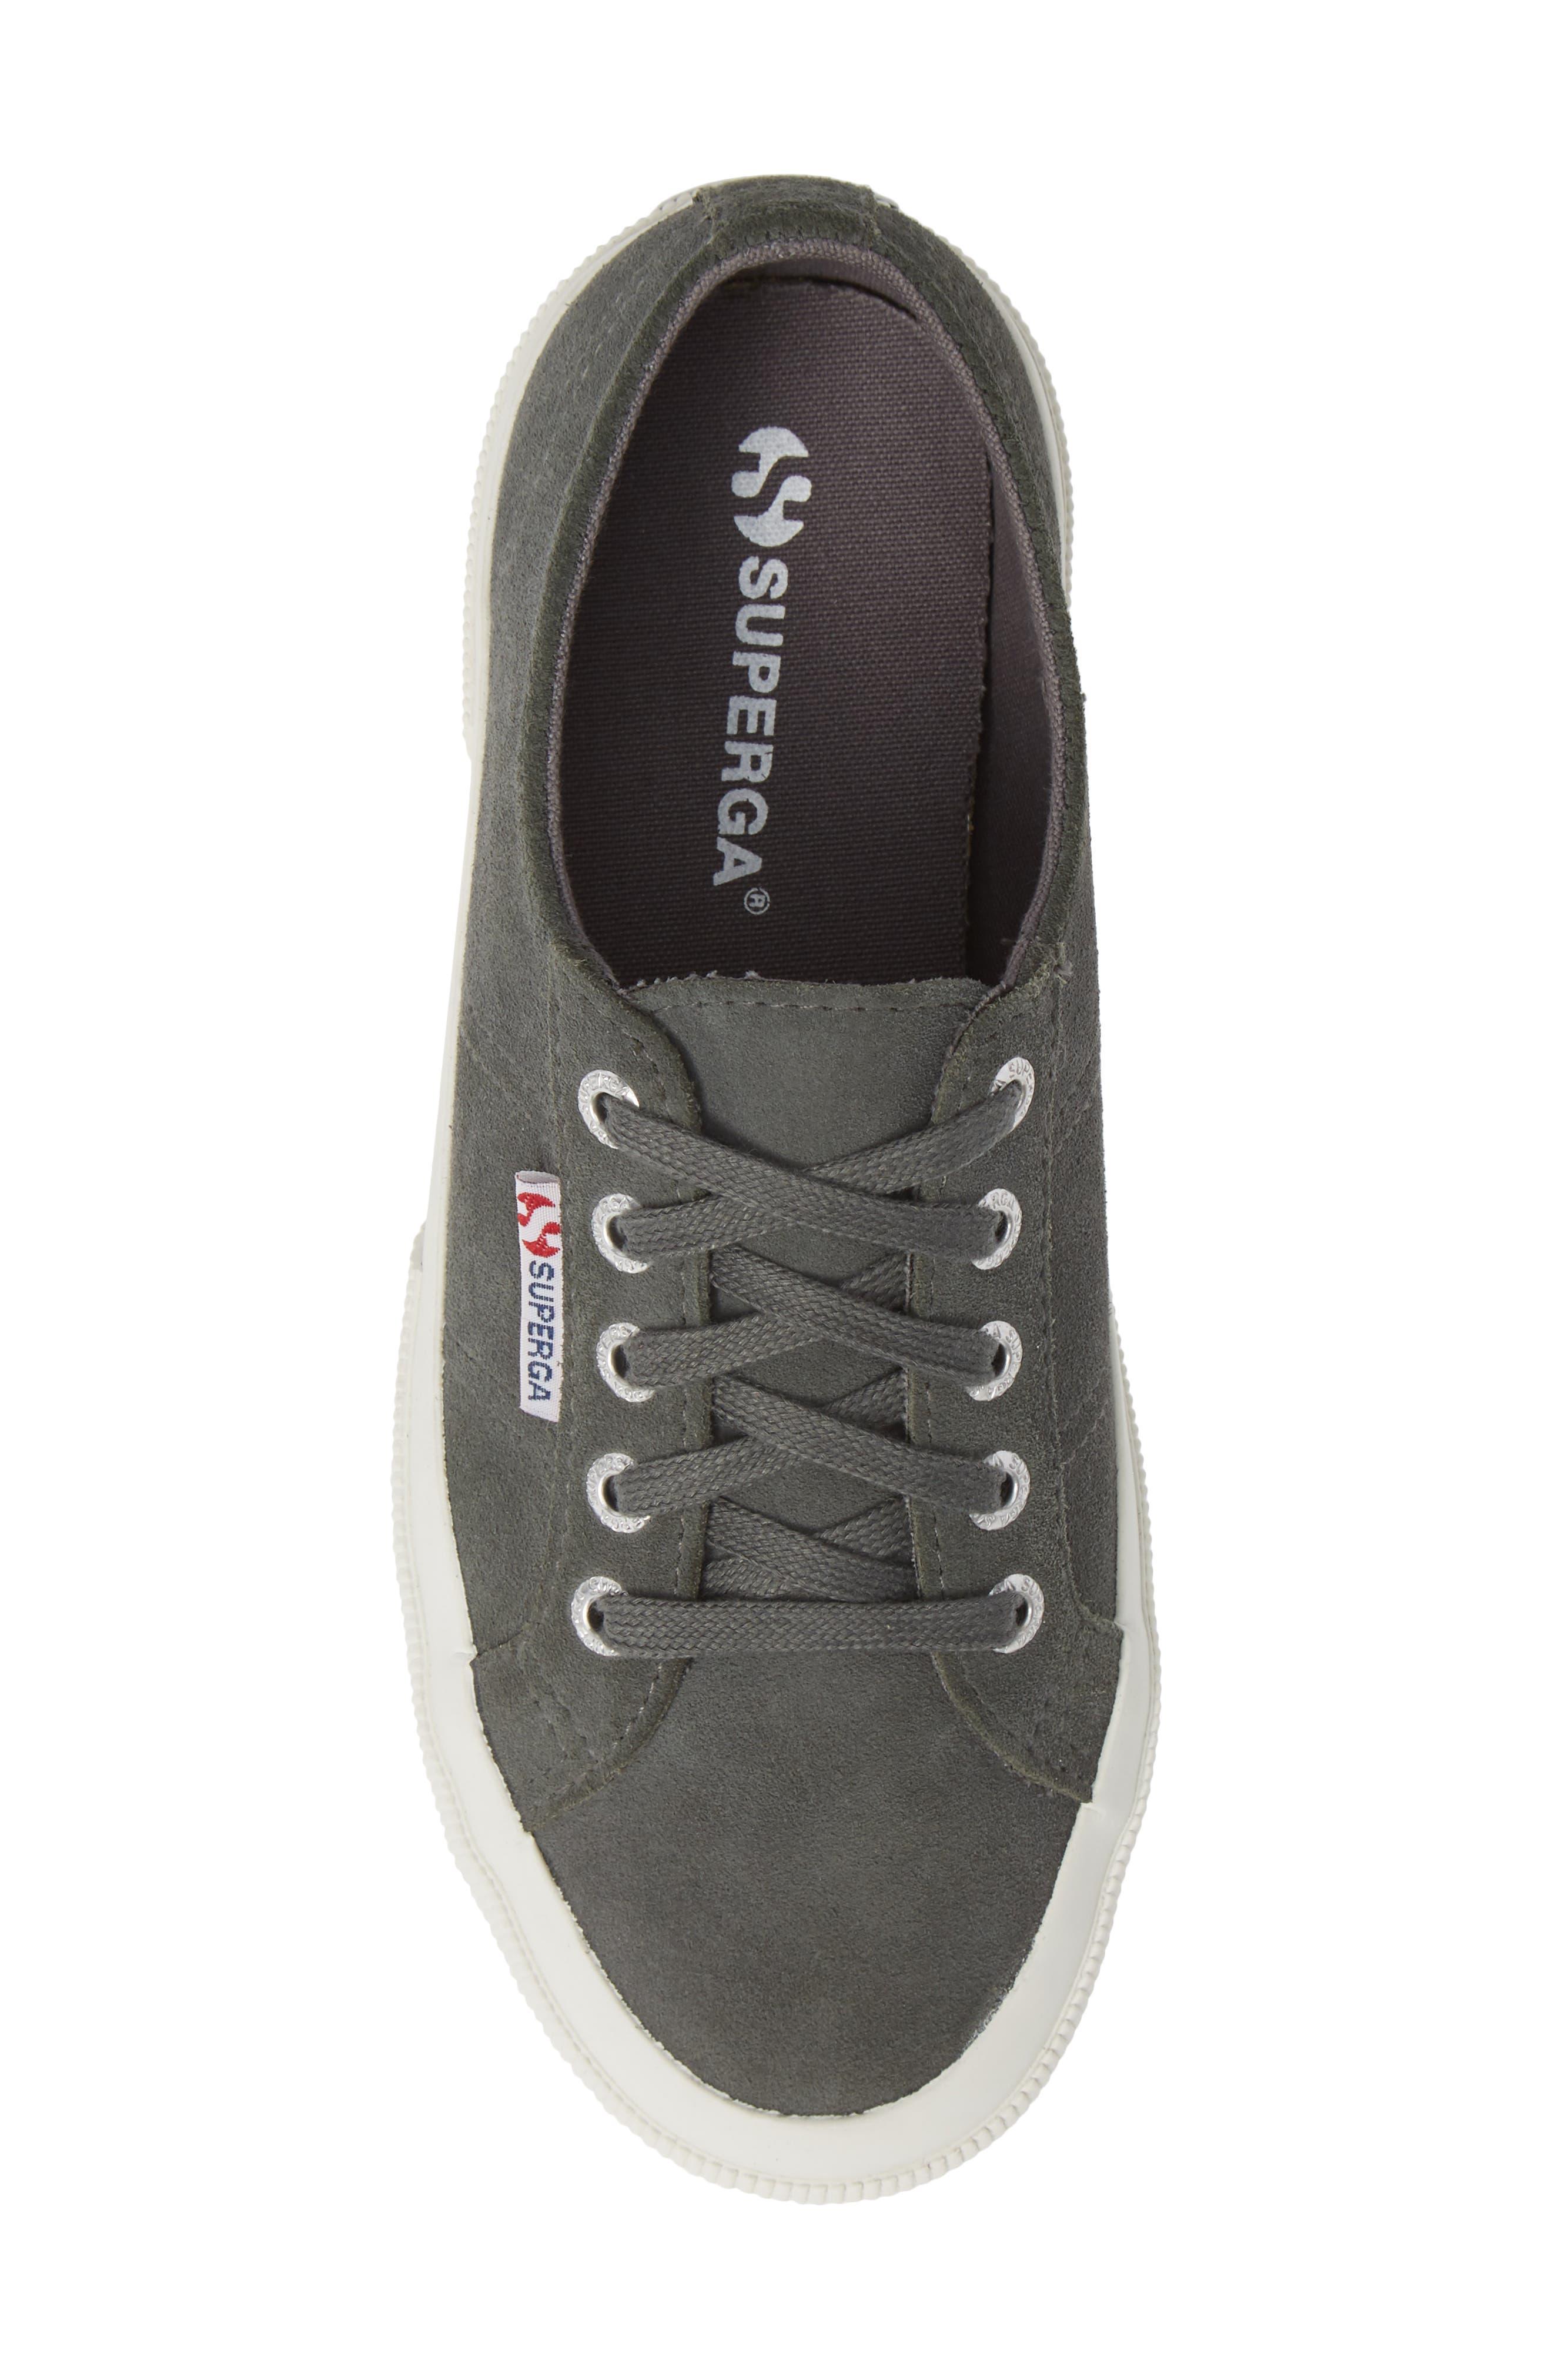 2750 Suecotw Low Top Sneaker,                             Alternate thumbnail 5, color,                             DARK GREY SUEDE